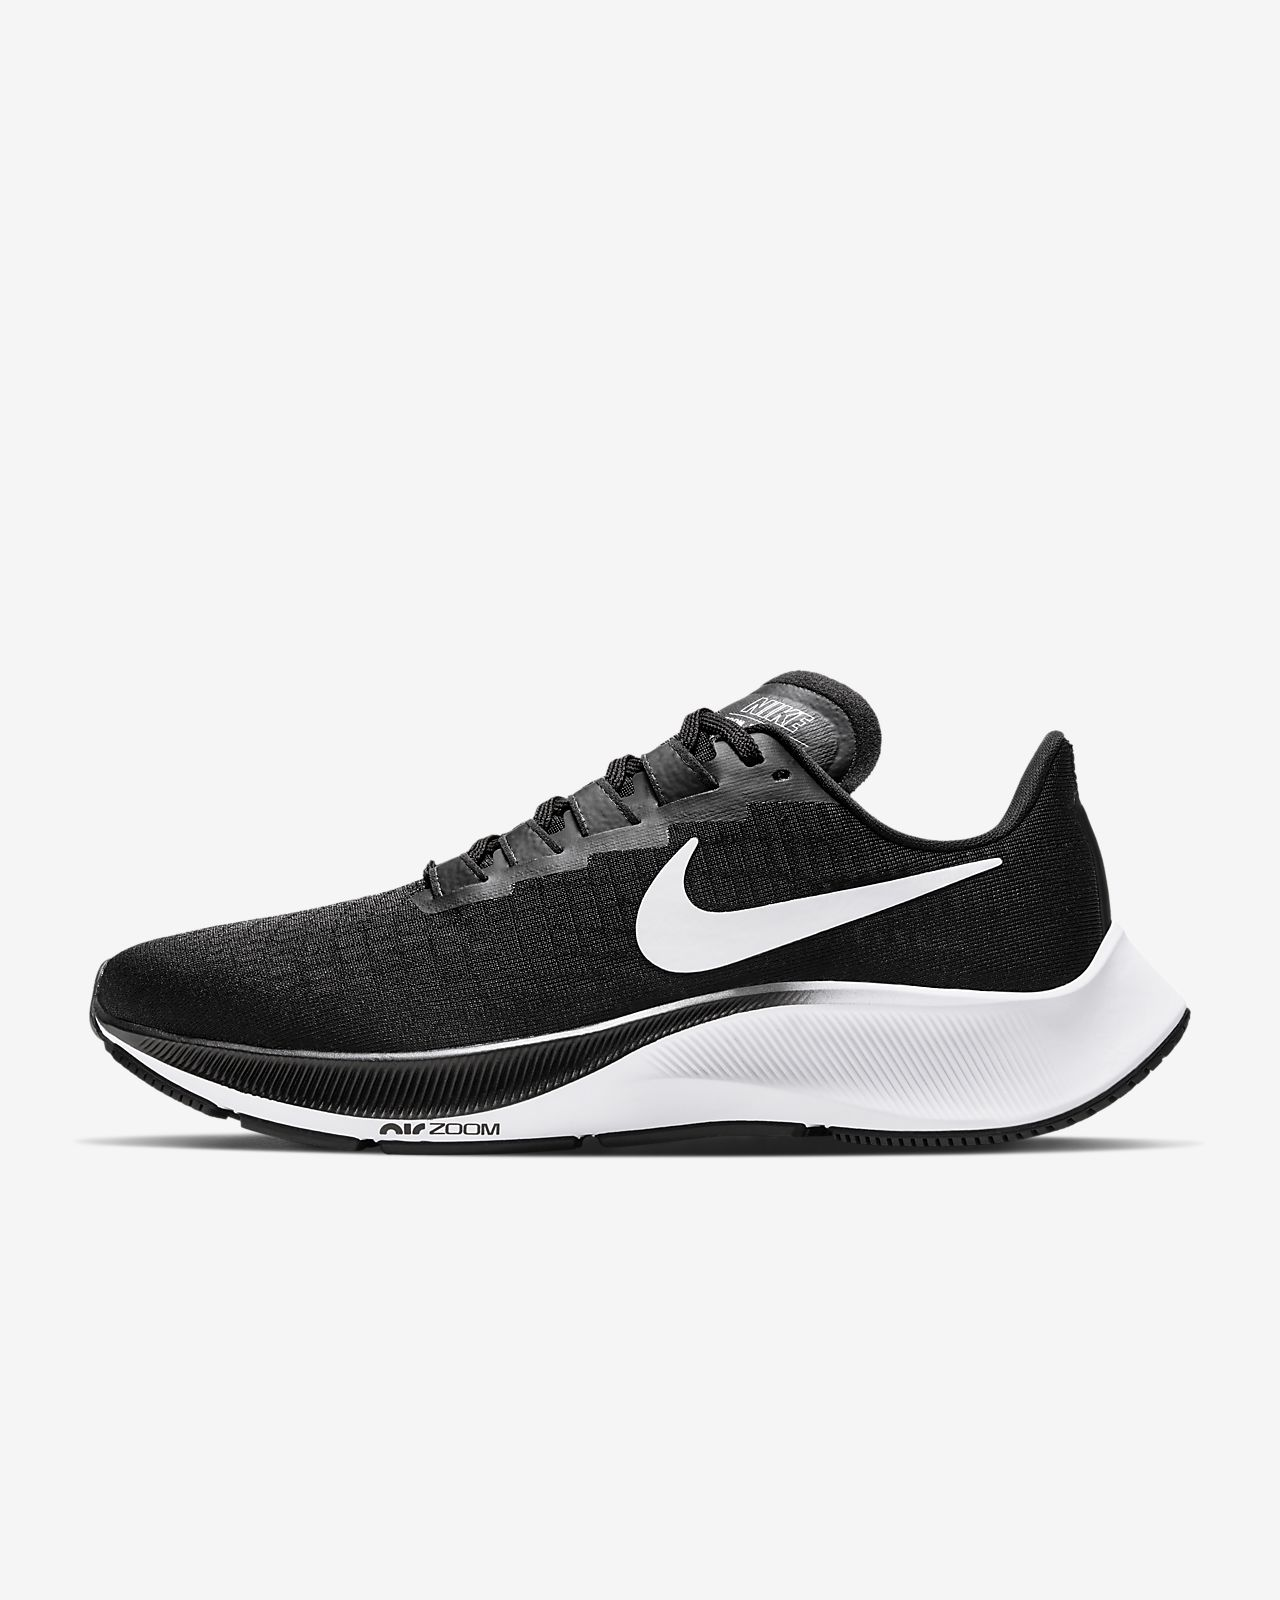 Löparsko Nike Air Zoom Pegasus 37 för kvinnor